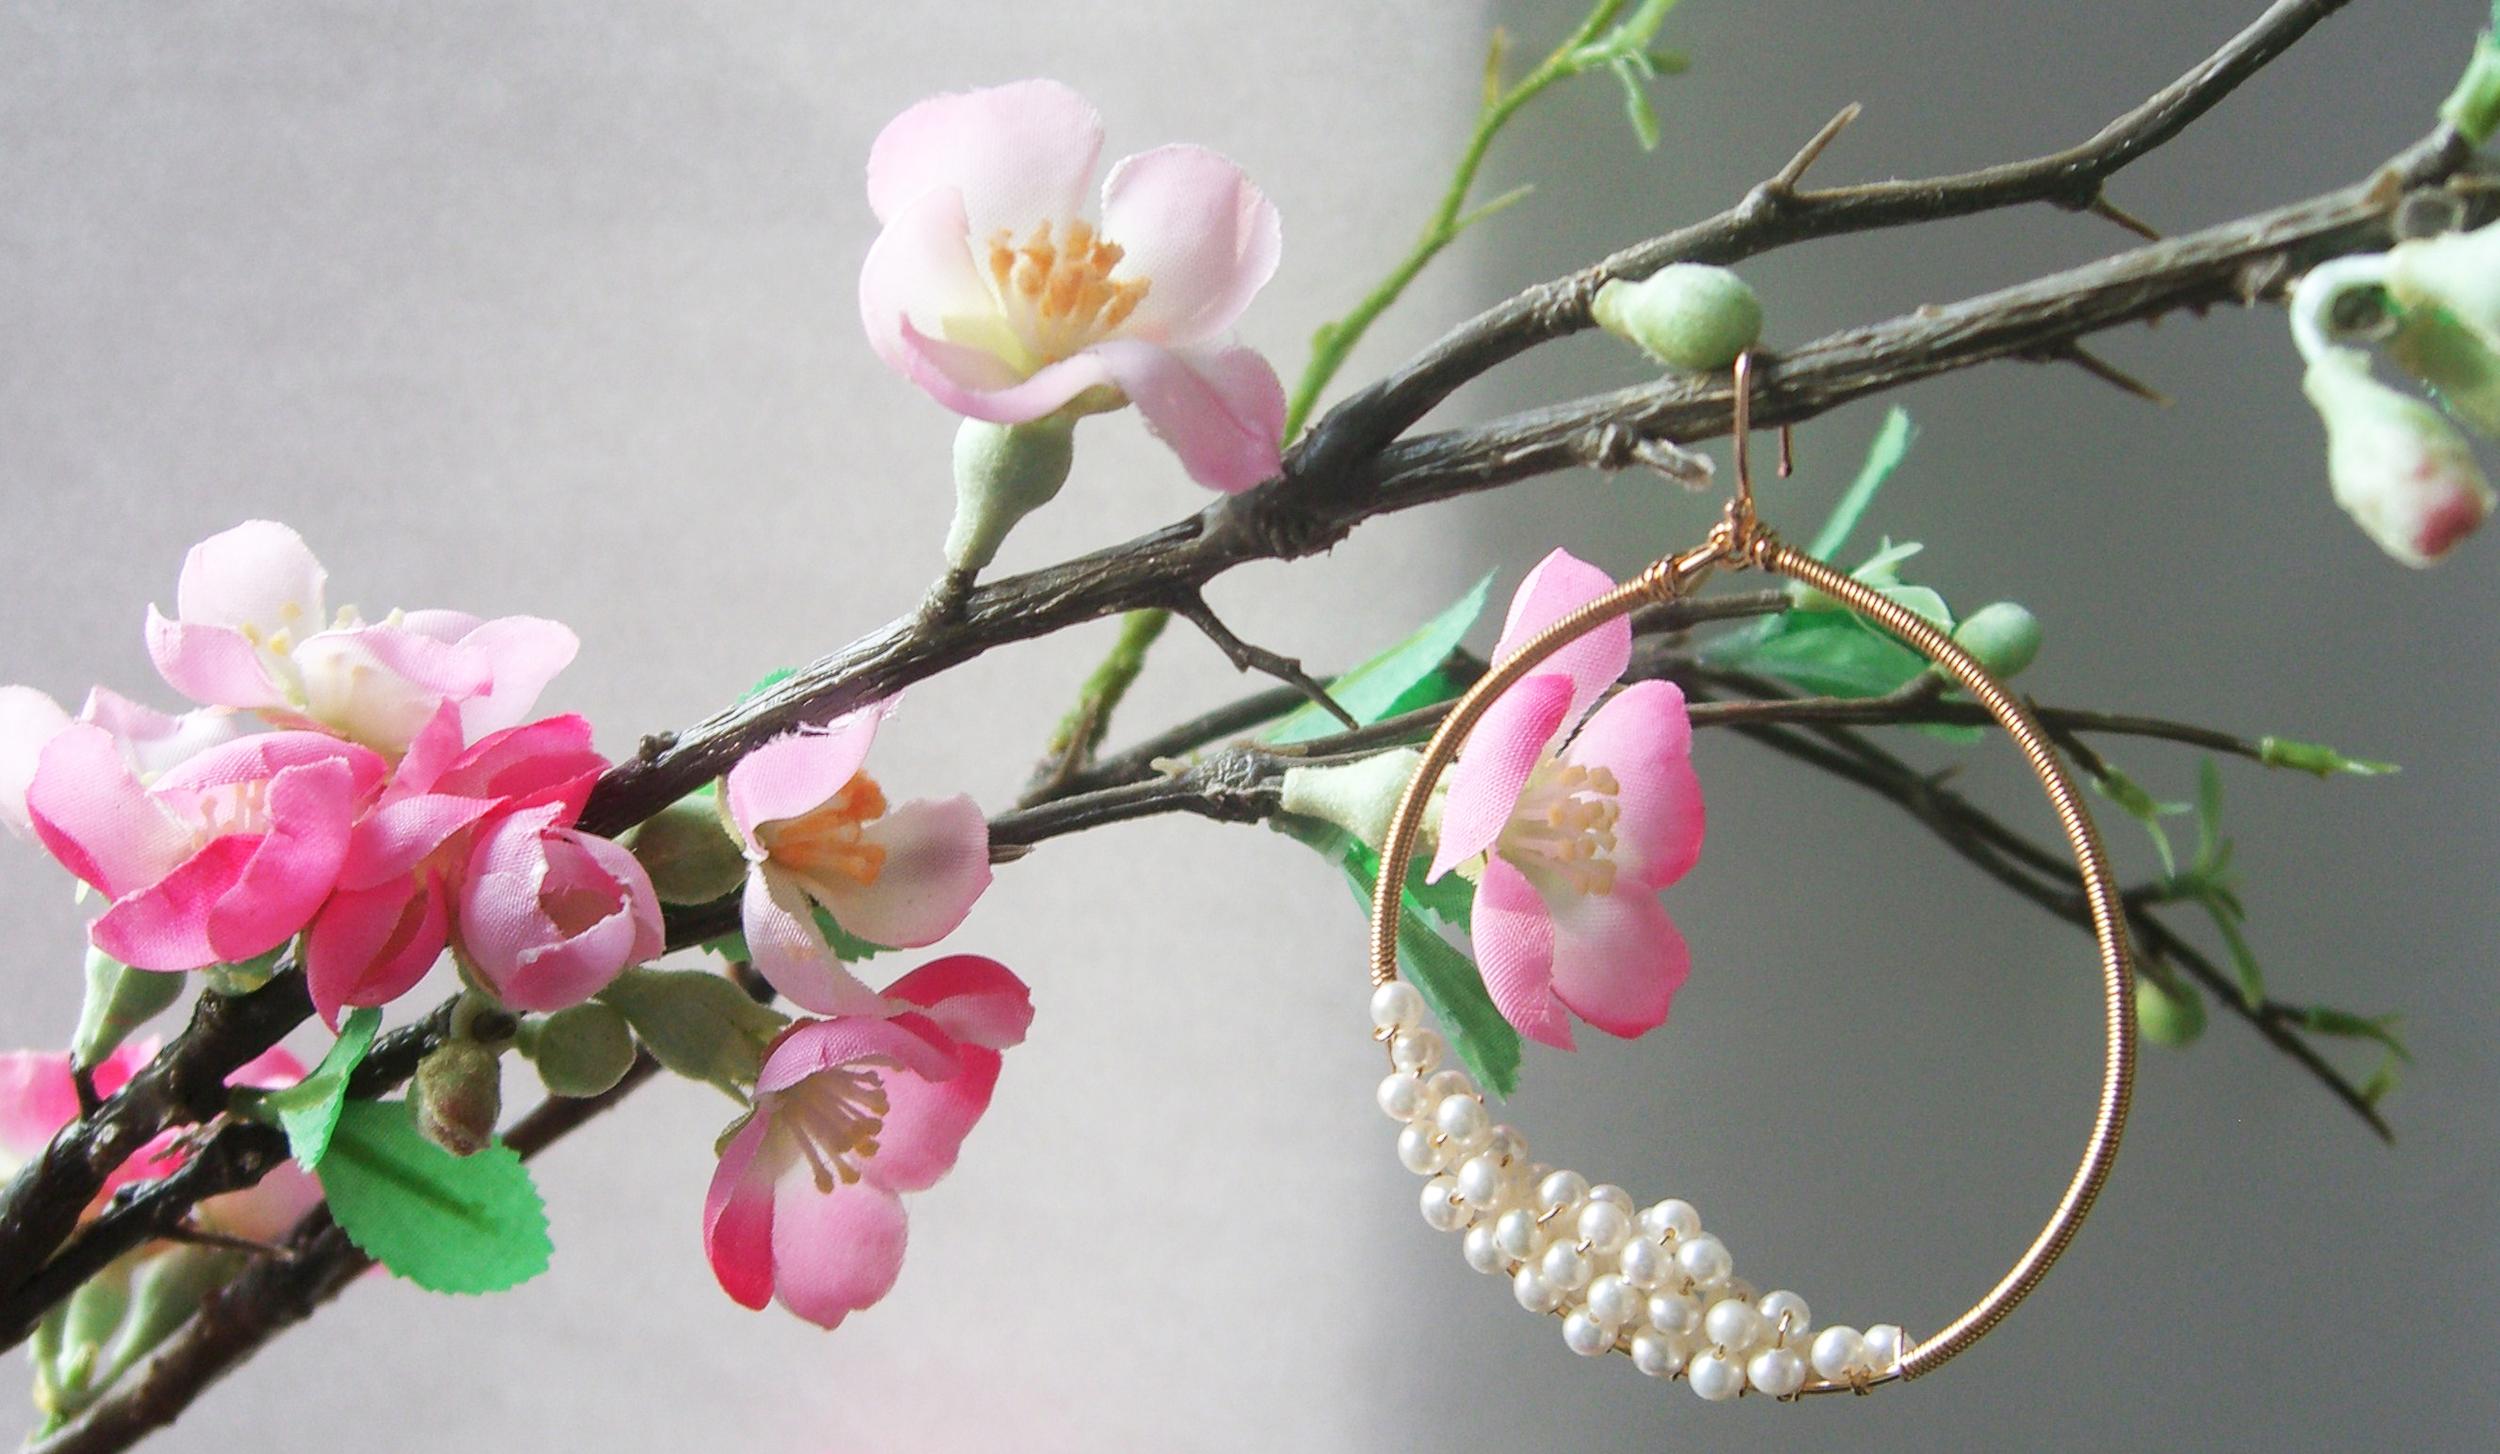 Flower_Moon_HiRes_smaller2.jpg